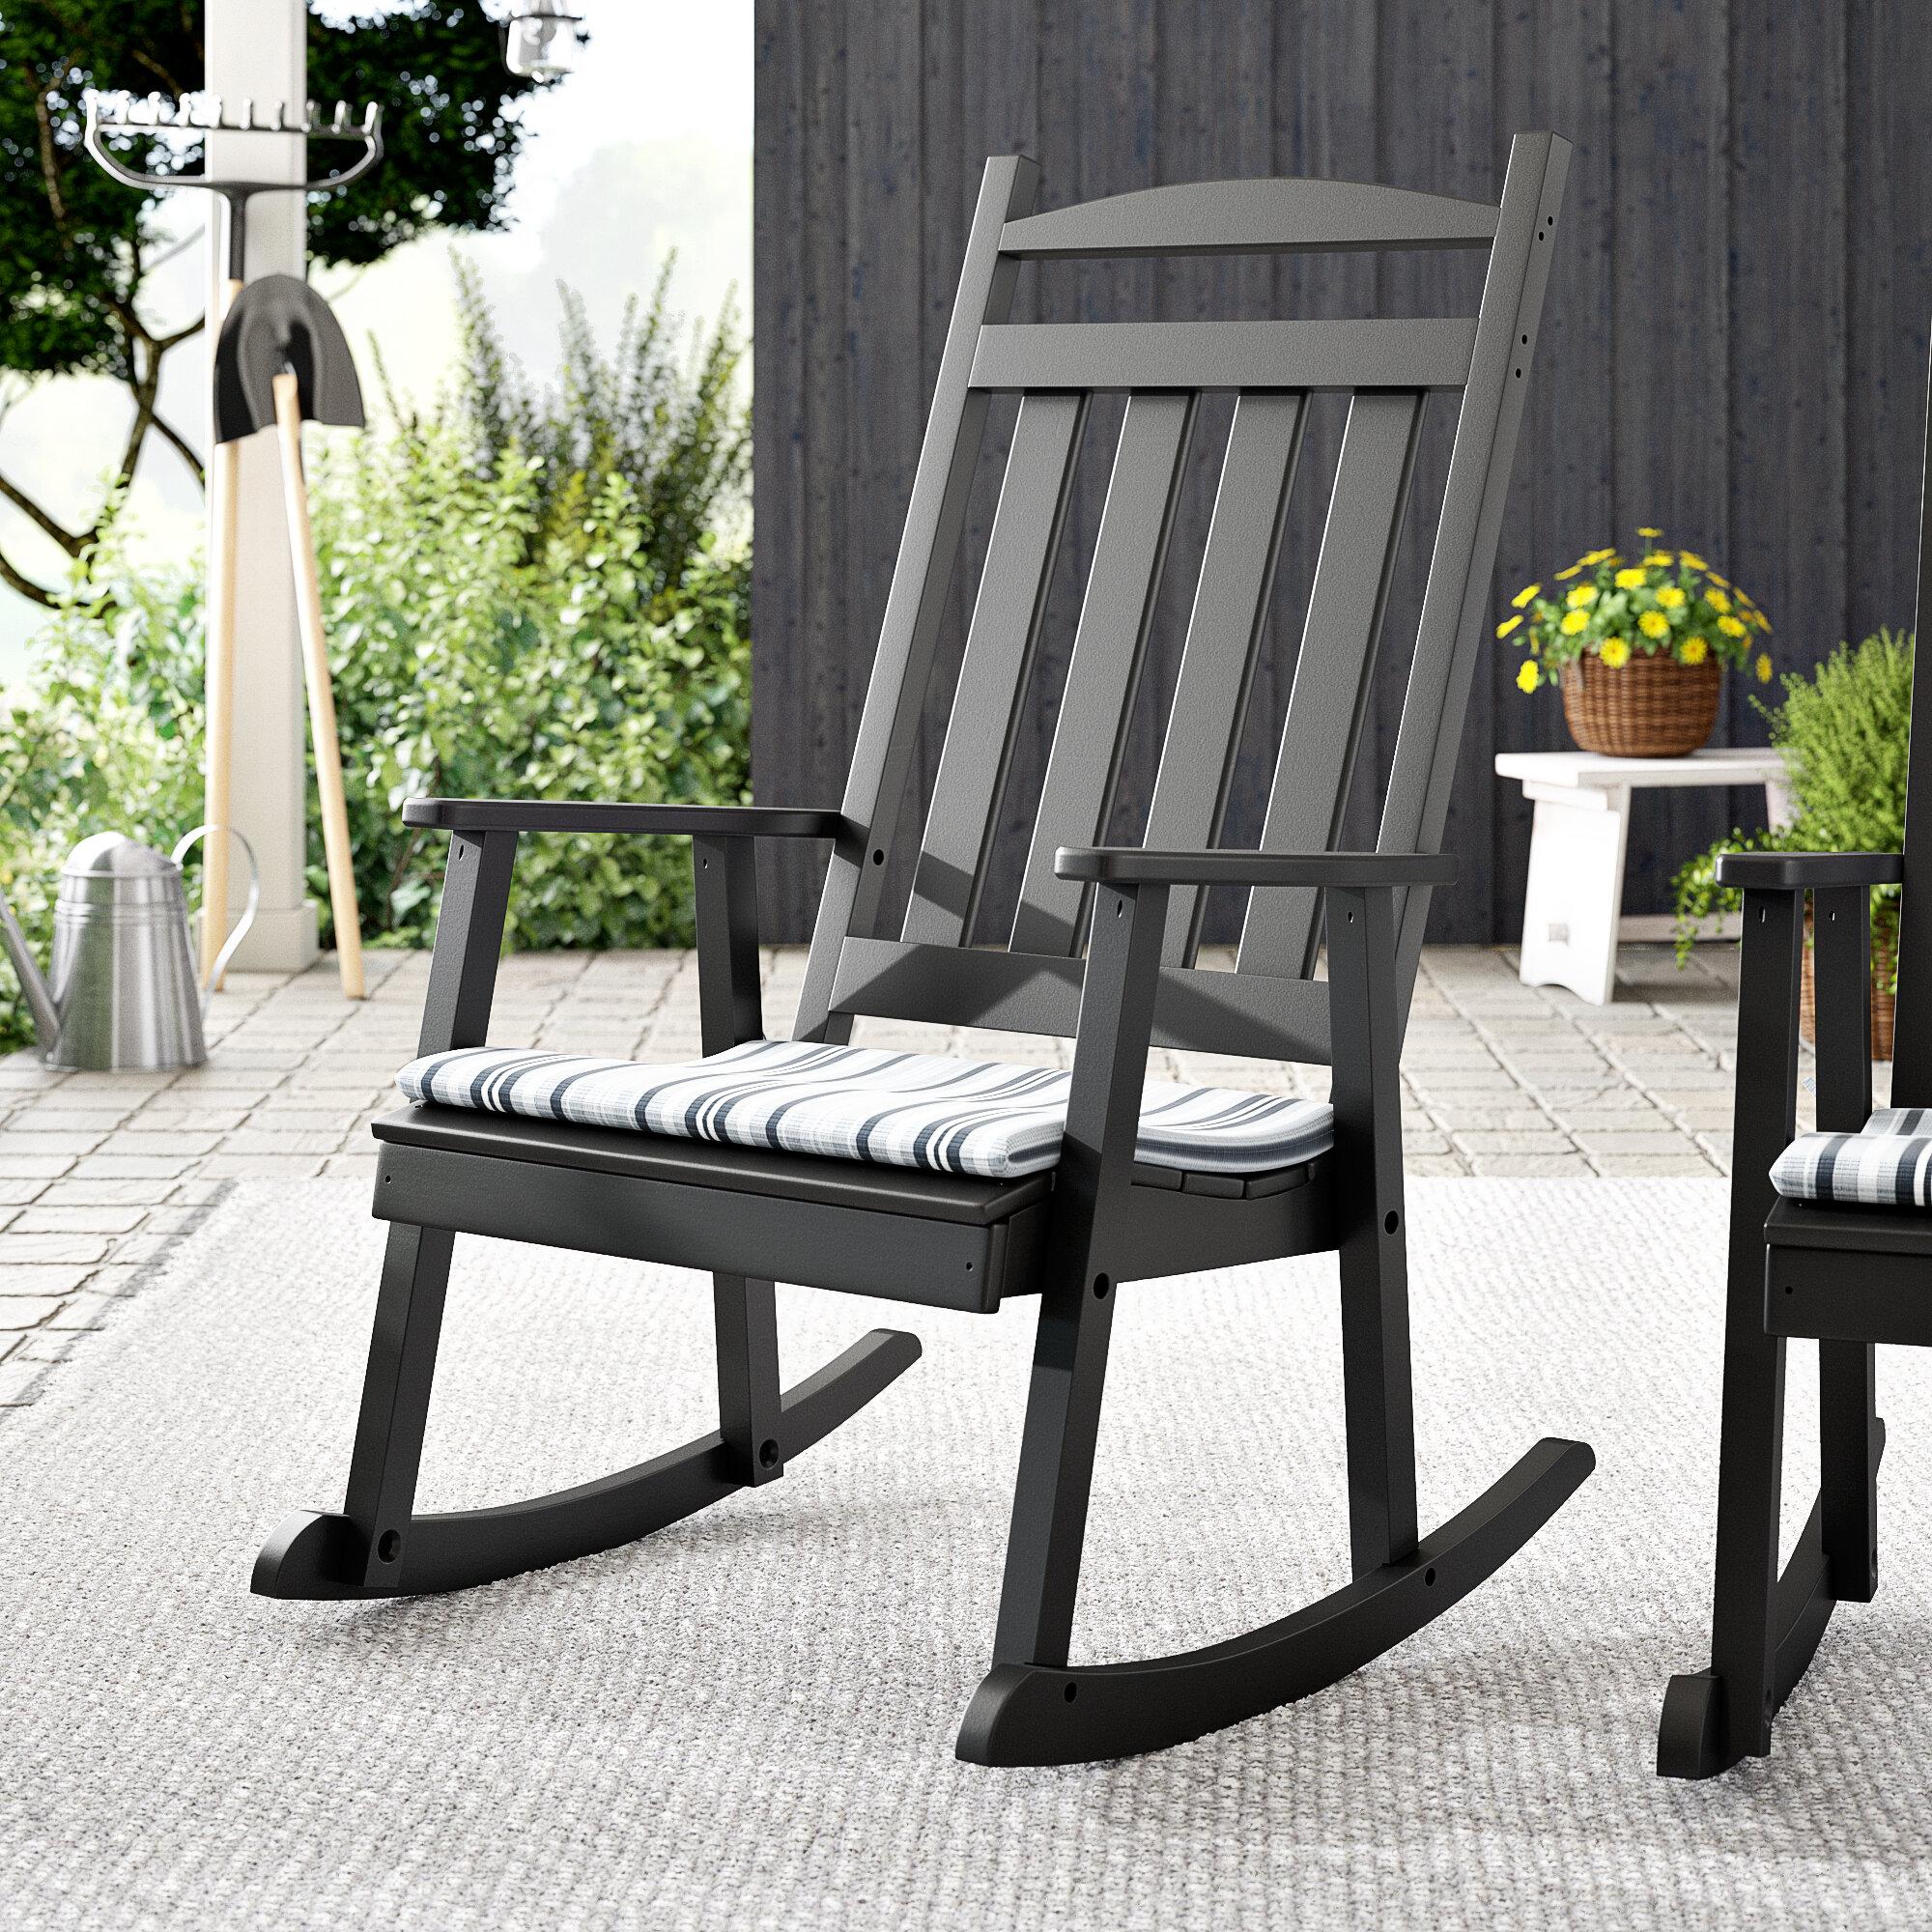 Astounding Extra Wide Rocking Chair Wayfair Download Free Architecture Designs Scobabritishbridgeorg